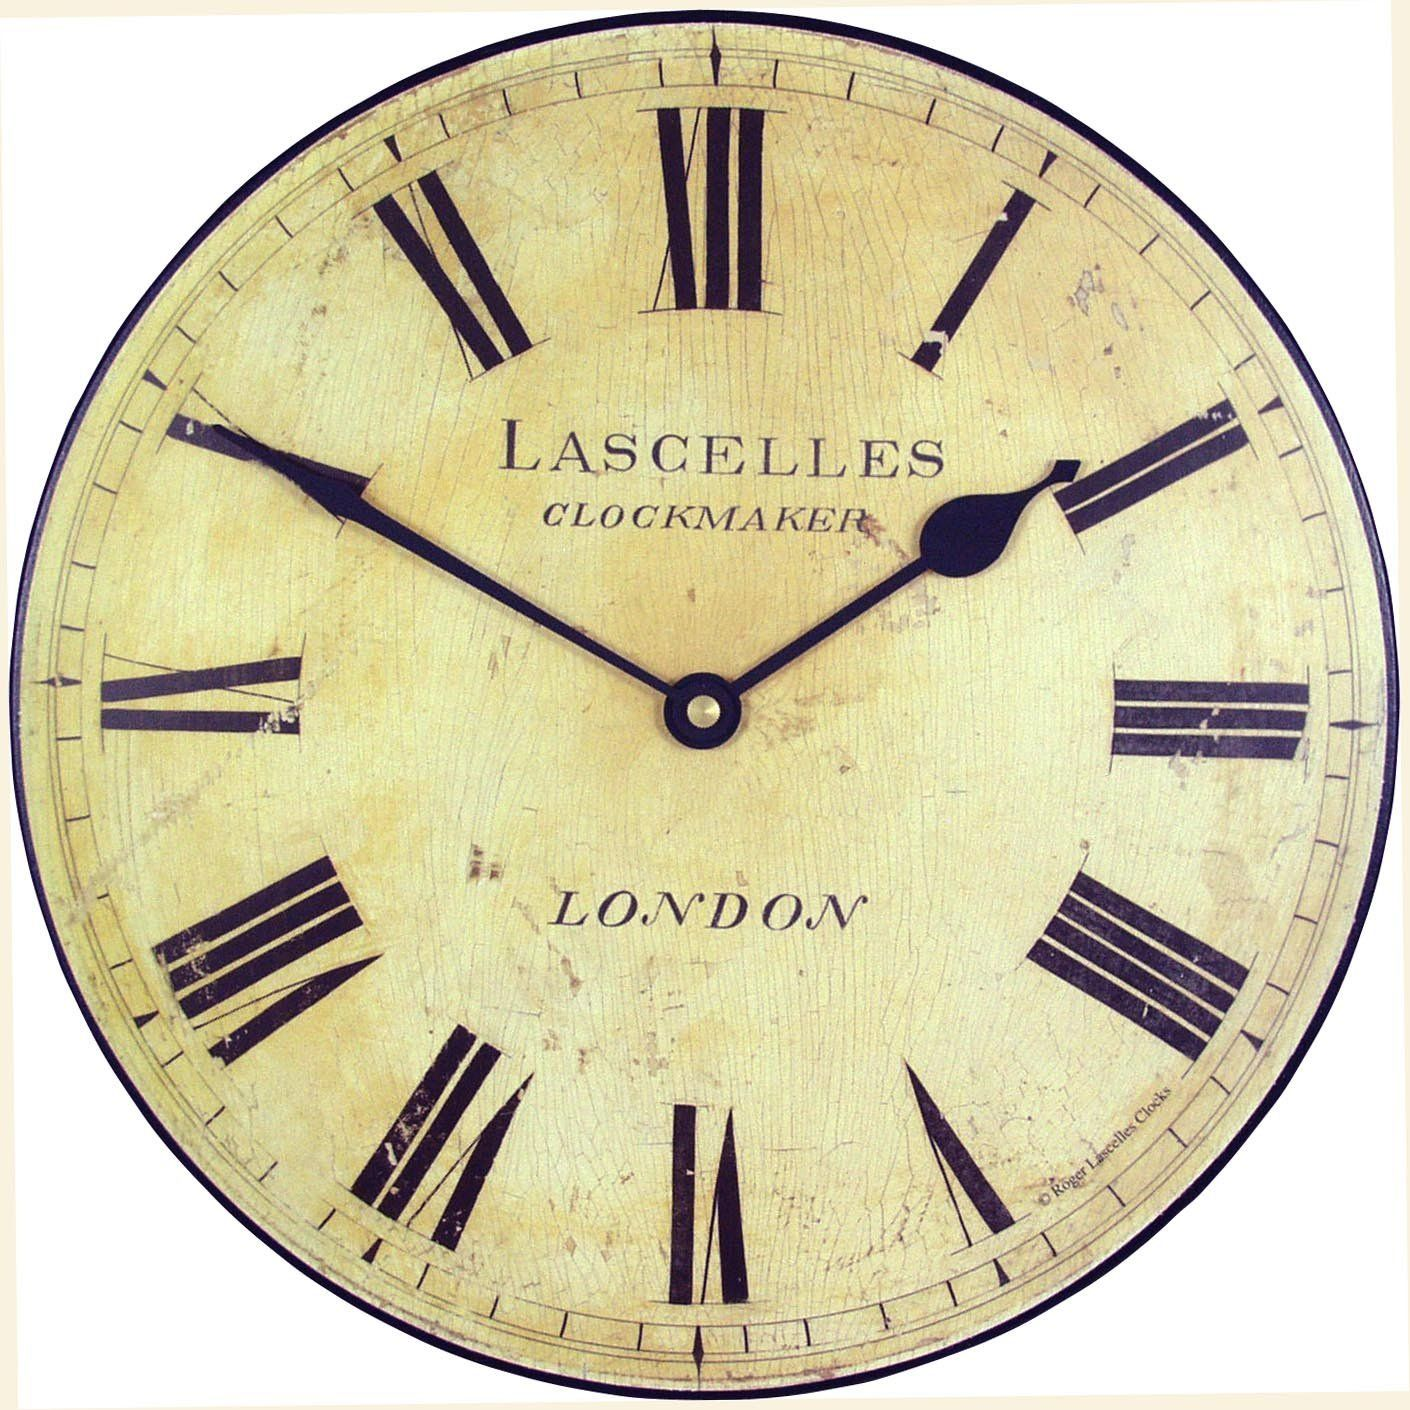 Amazon roger lascelles medium lascelles wall clock 10 inch amazon roger lascelles medium lascelles wall clock 10 inch vintage amipublicfo Gallery